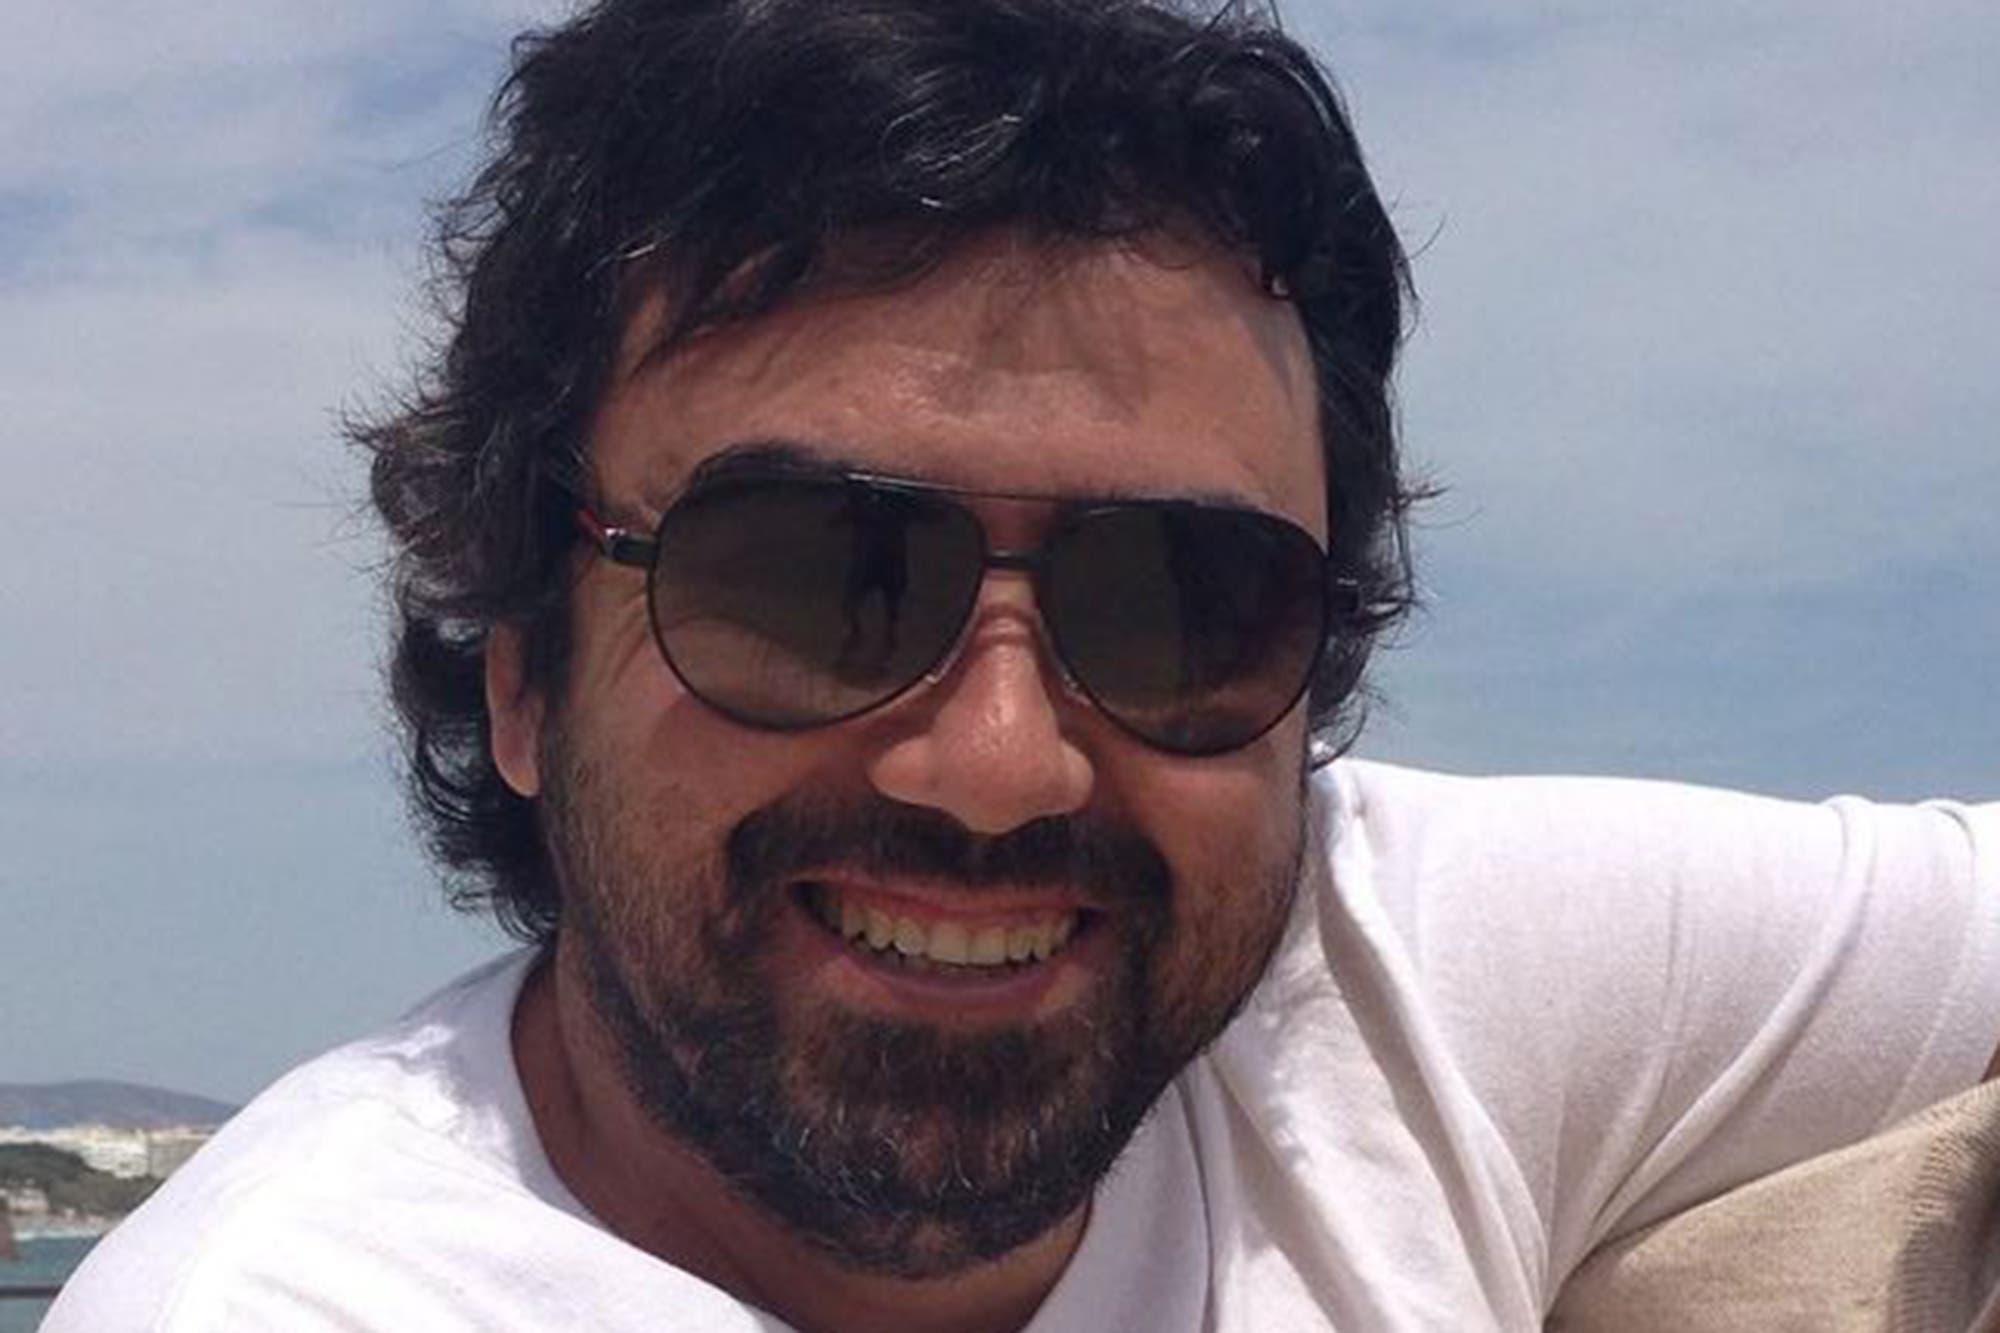 Juan Cruz Avila dejó A24 para volver al deporte